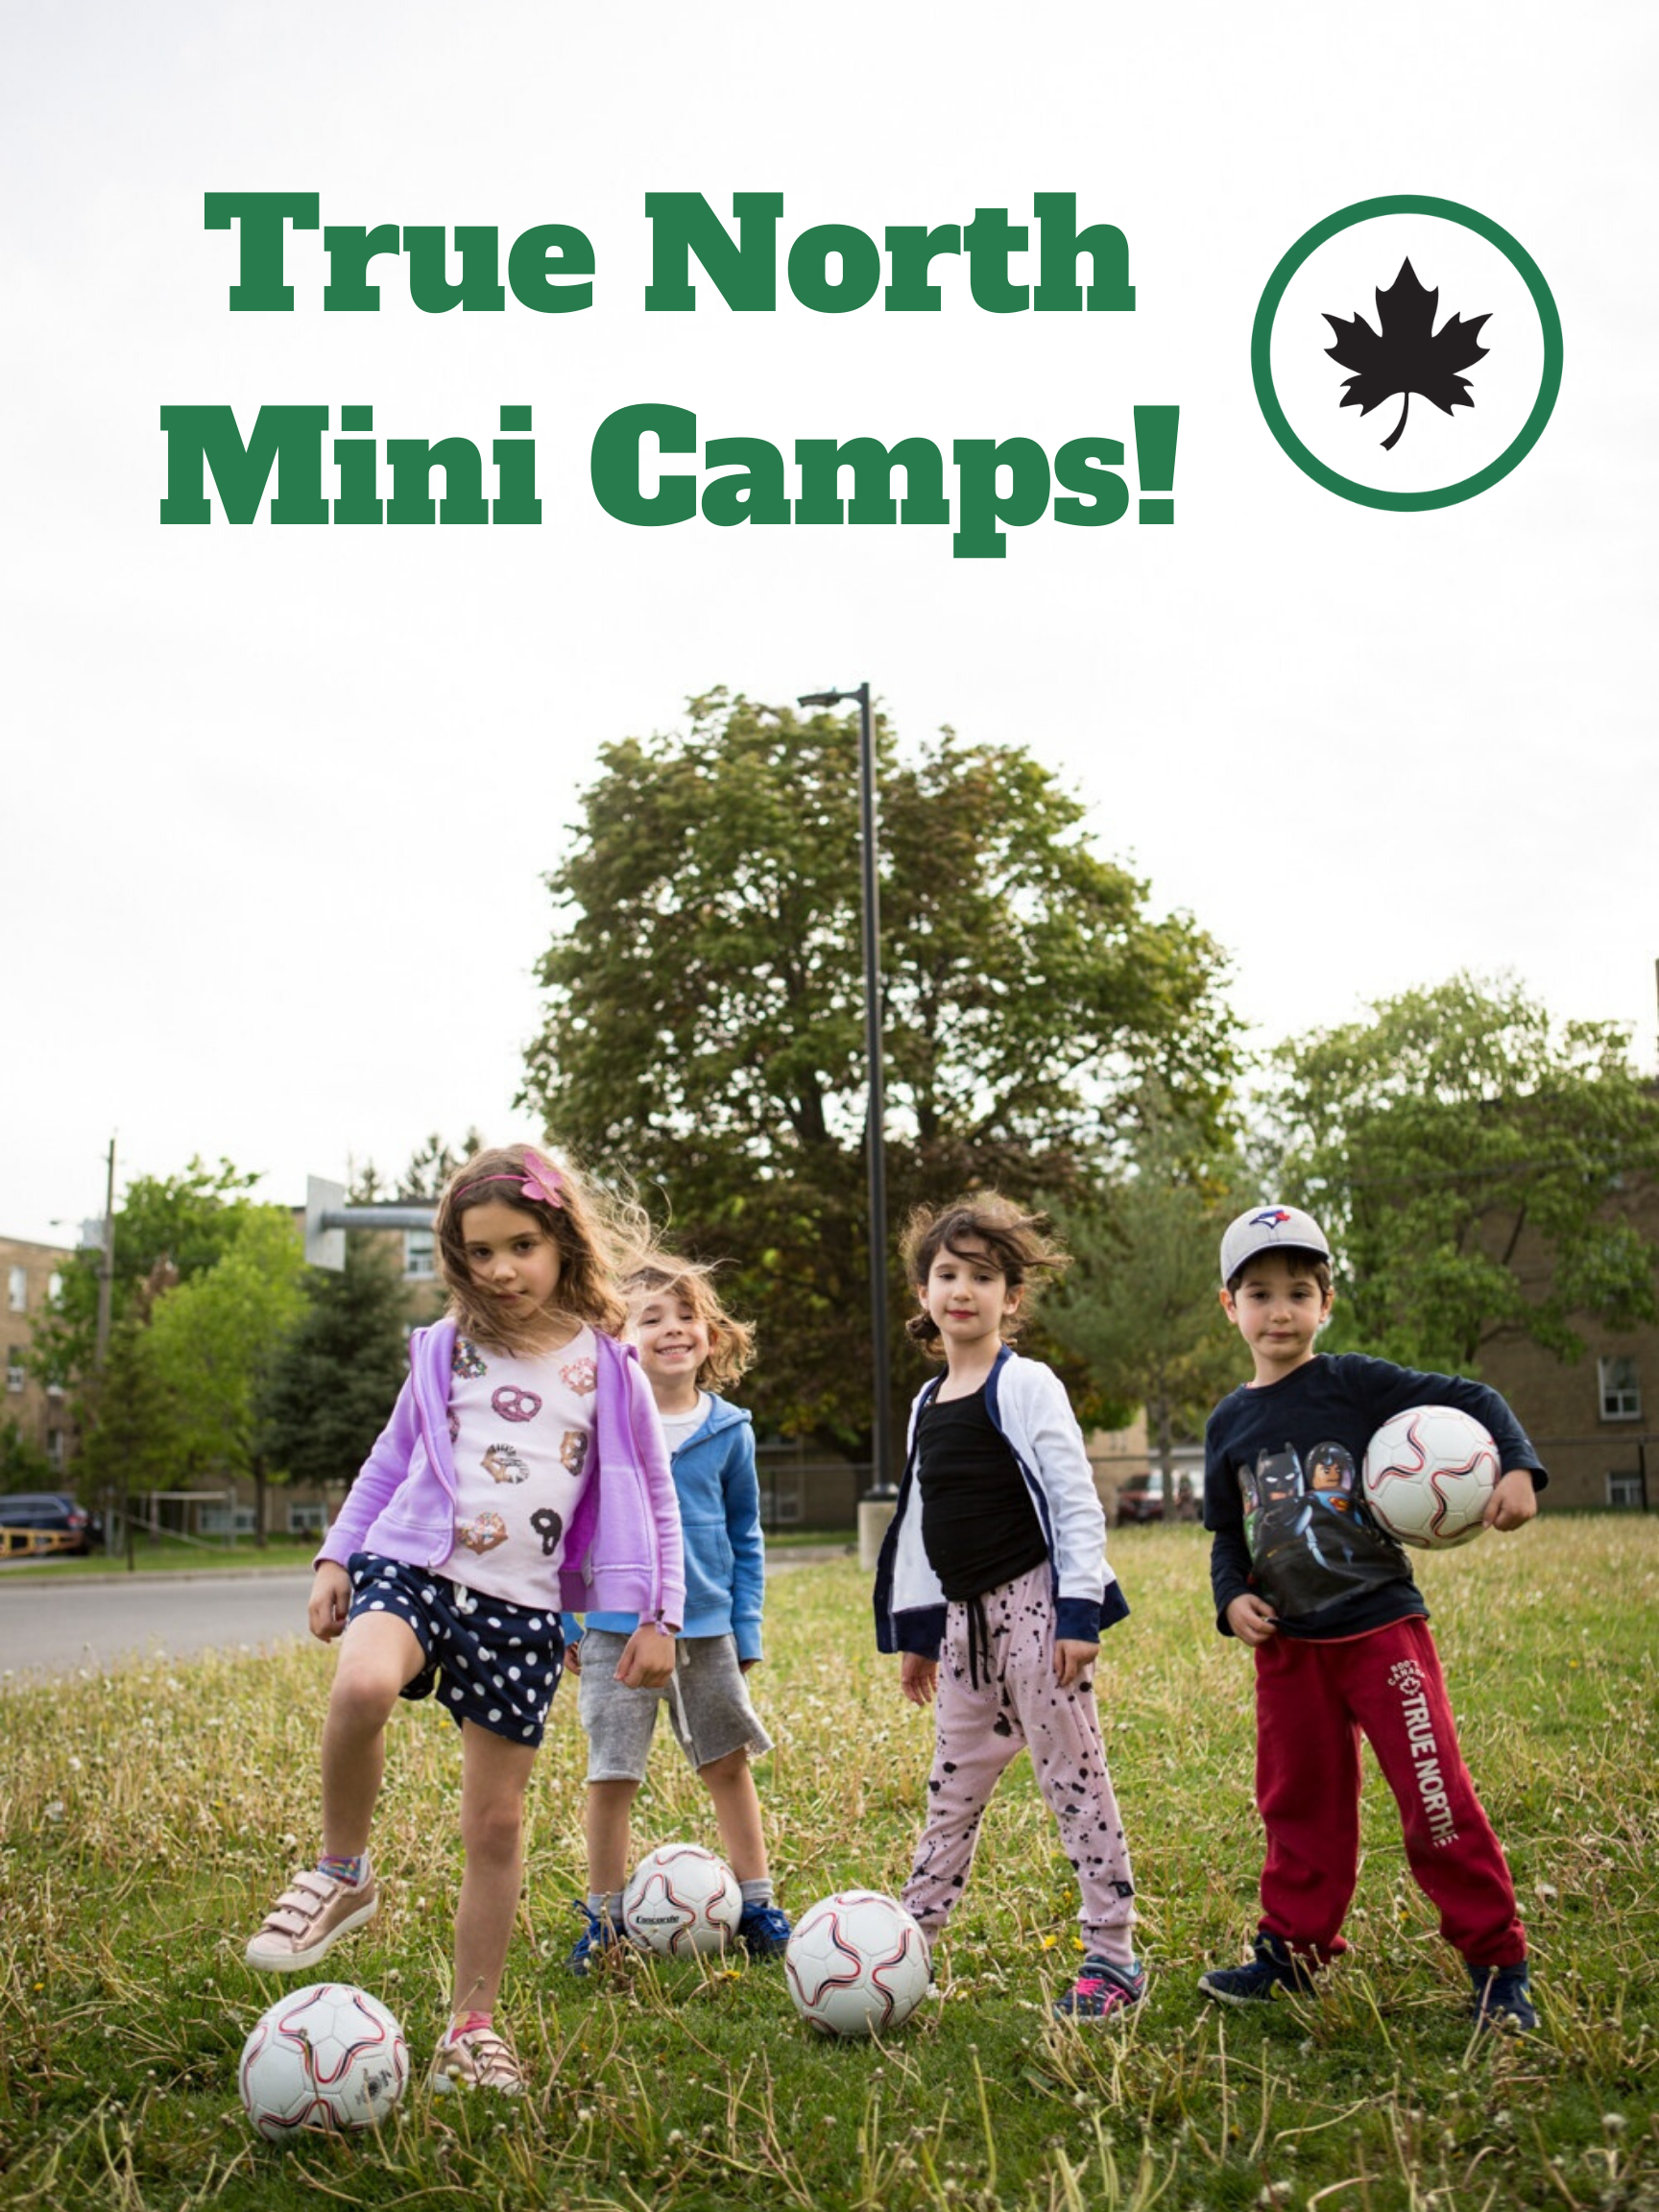 True North Mini Camps!